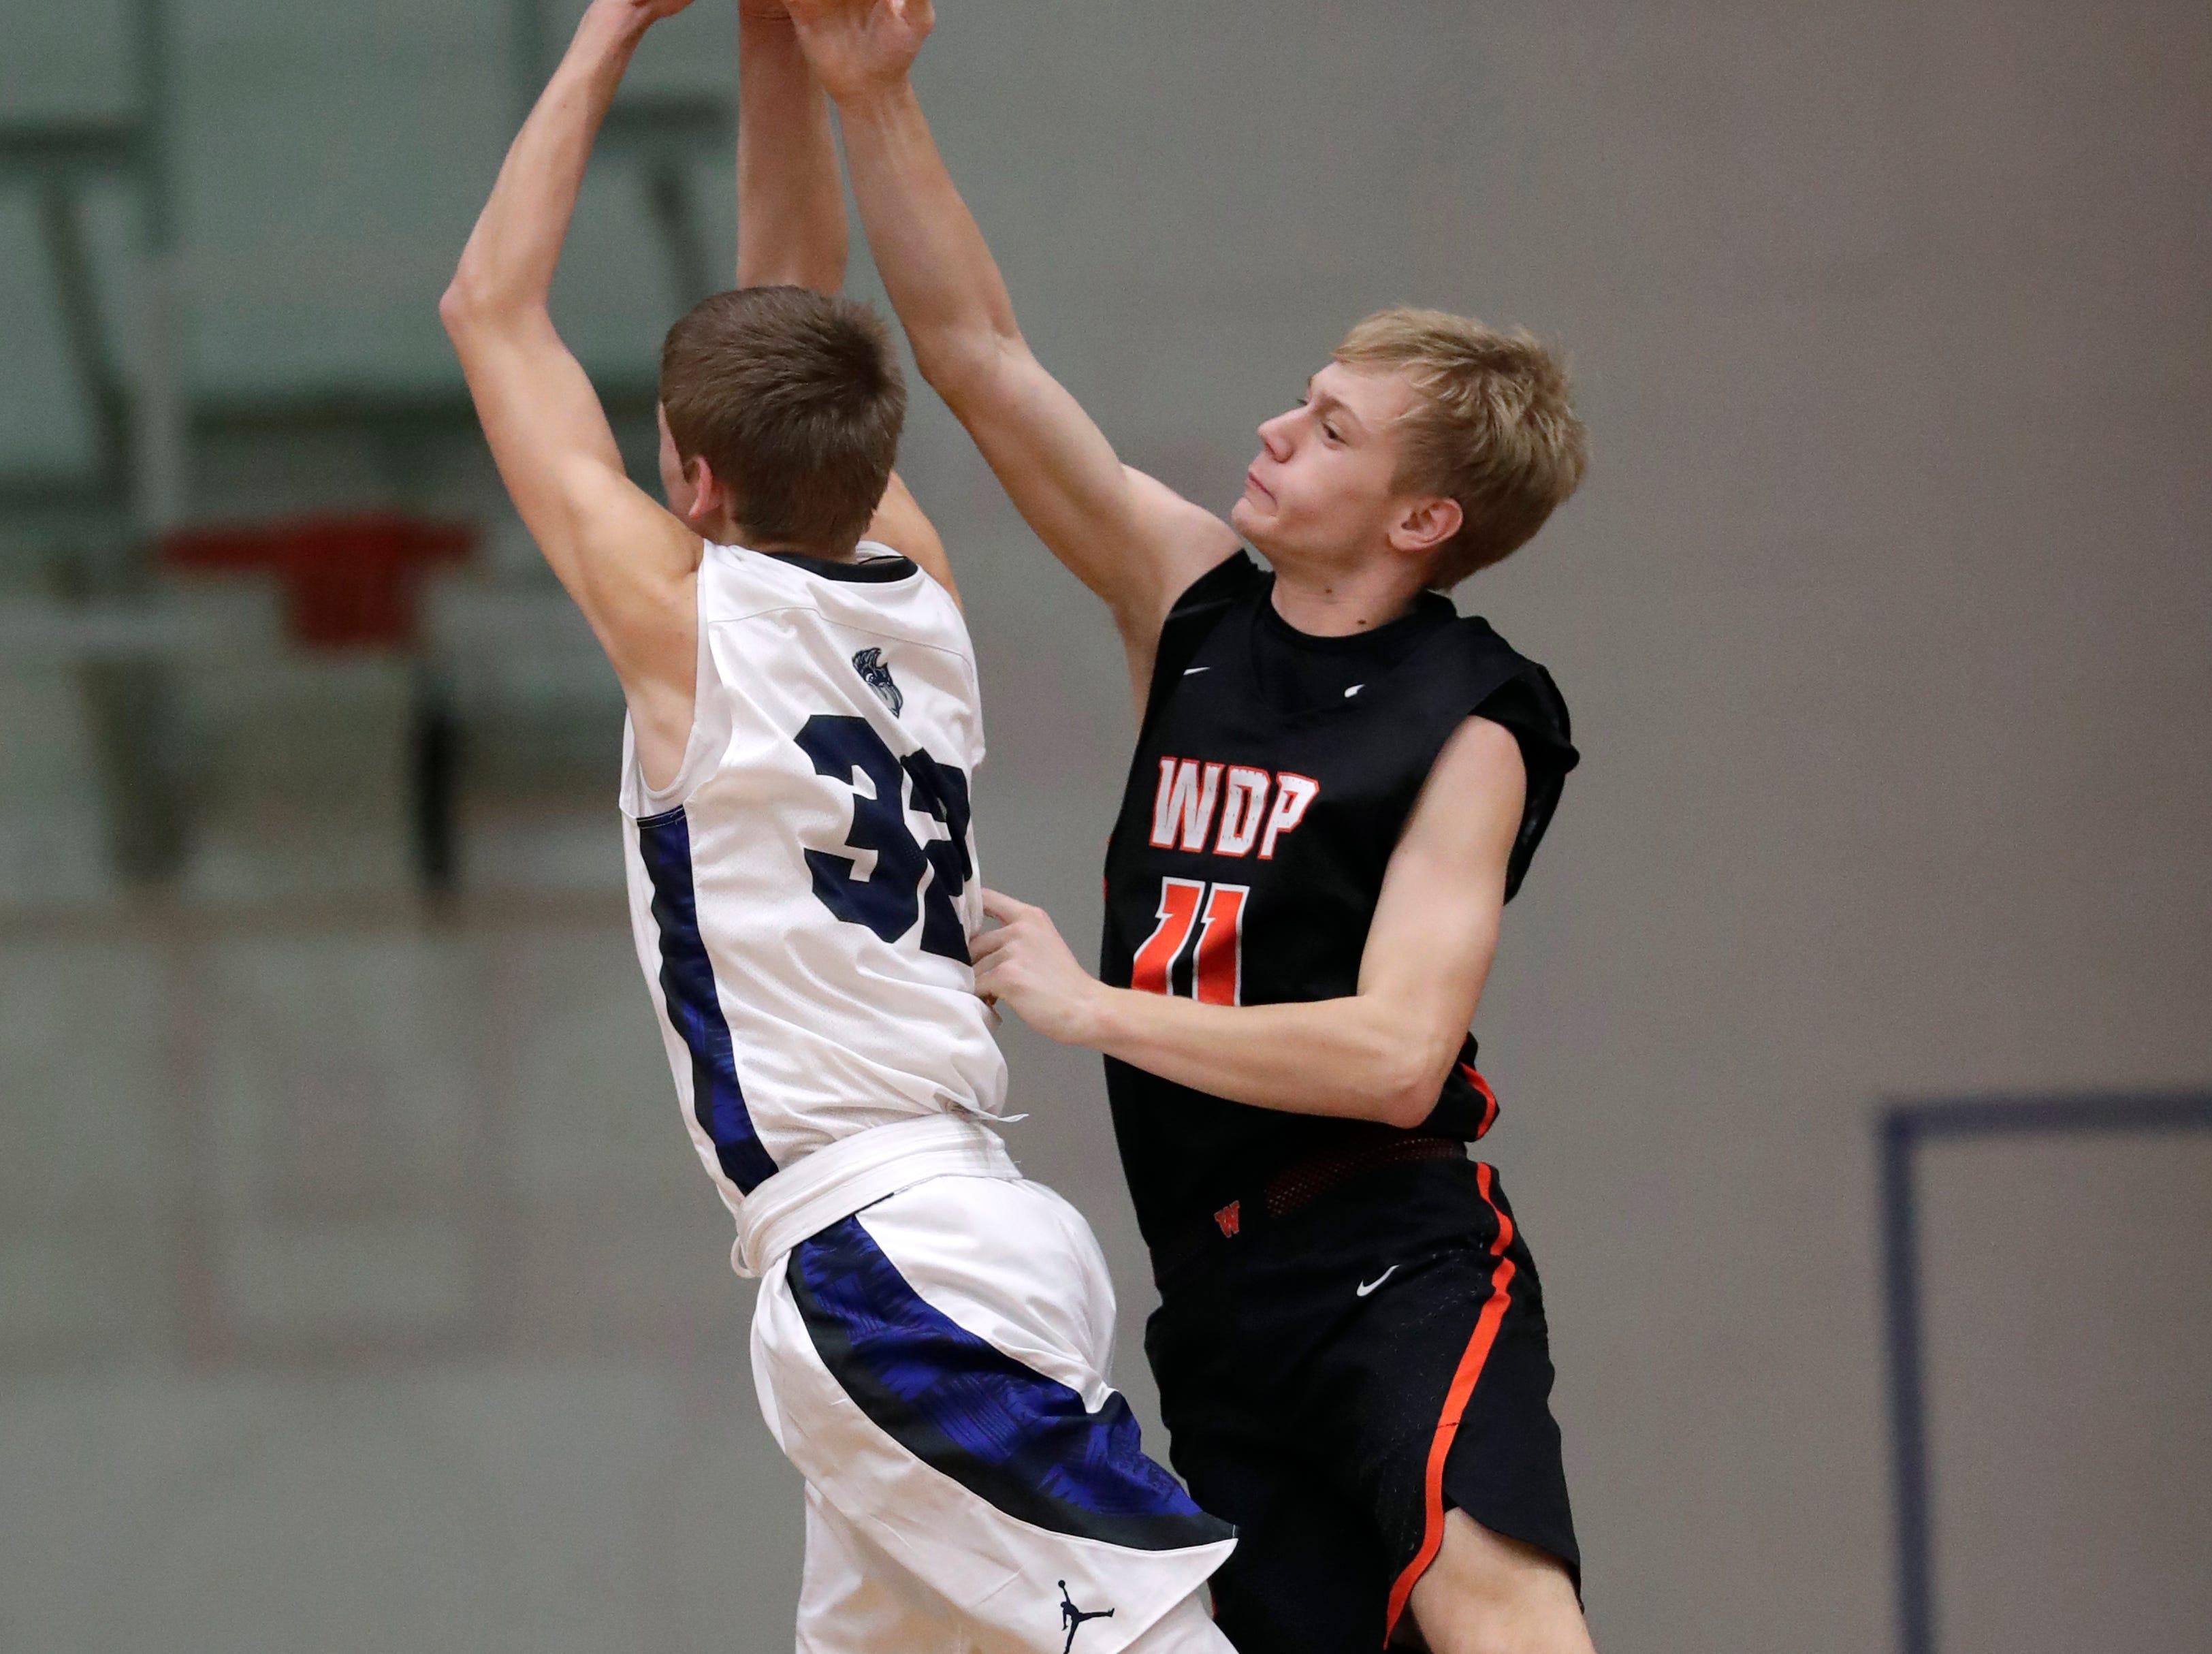 Menasha High School's Jordan Nowak (32) puts up a shot against West De Pere High School's Brady Darrow (11) during their boys basketball game Tuesday, December 11, 2018, in Menasha, Wis. Dan Powers/USA TODAY NETWORK-Wisconsin